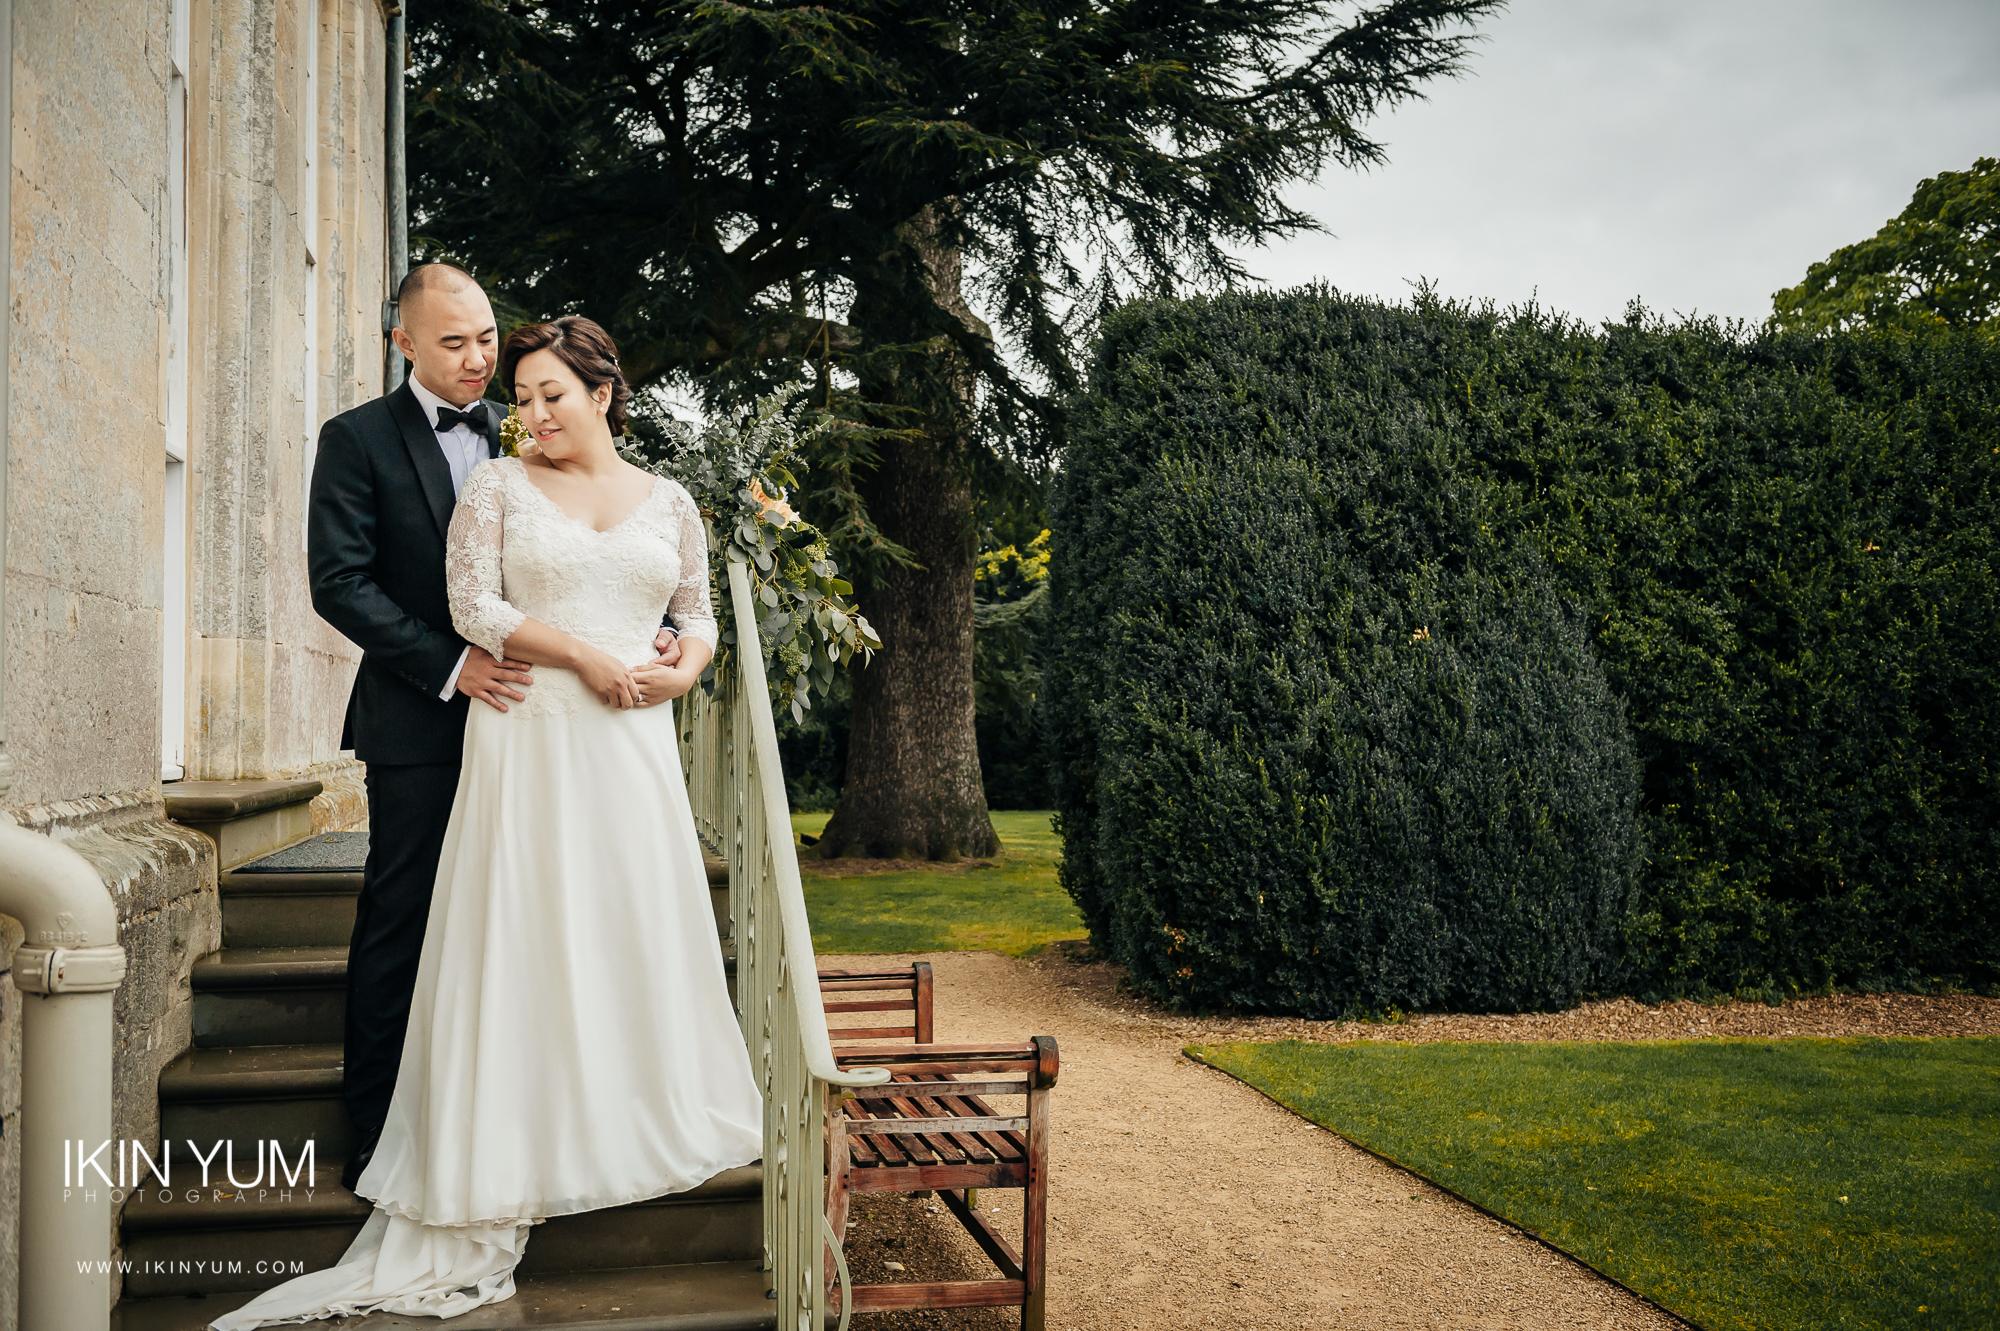 Elmore Court Wedding- Ikin Yum Photography-0076.jpg